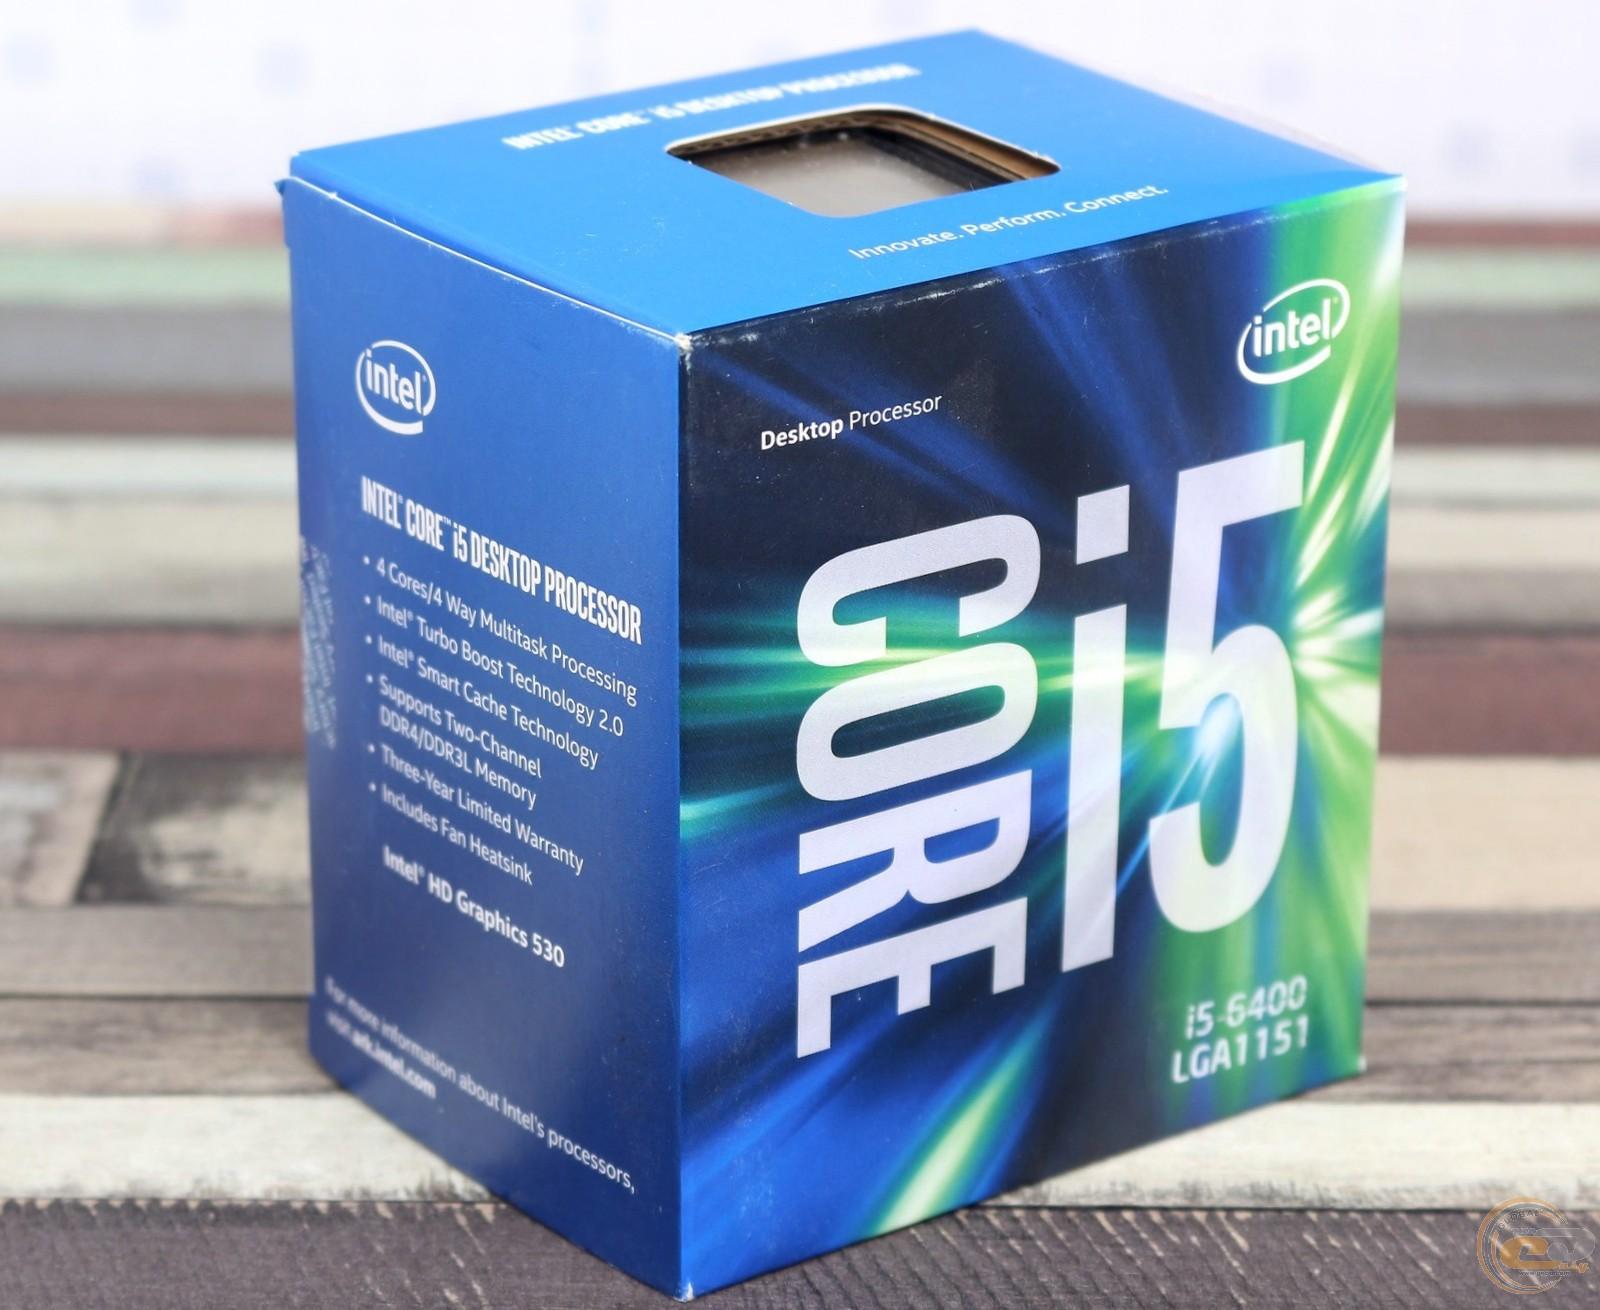 Intel Core I5 6400 1 27ghz Cache 6mb Box Socket Lga 1151 Skylake Series